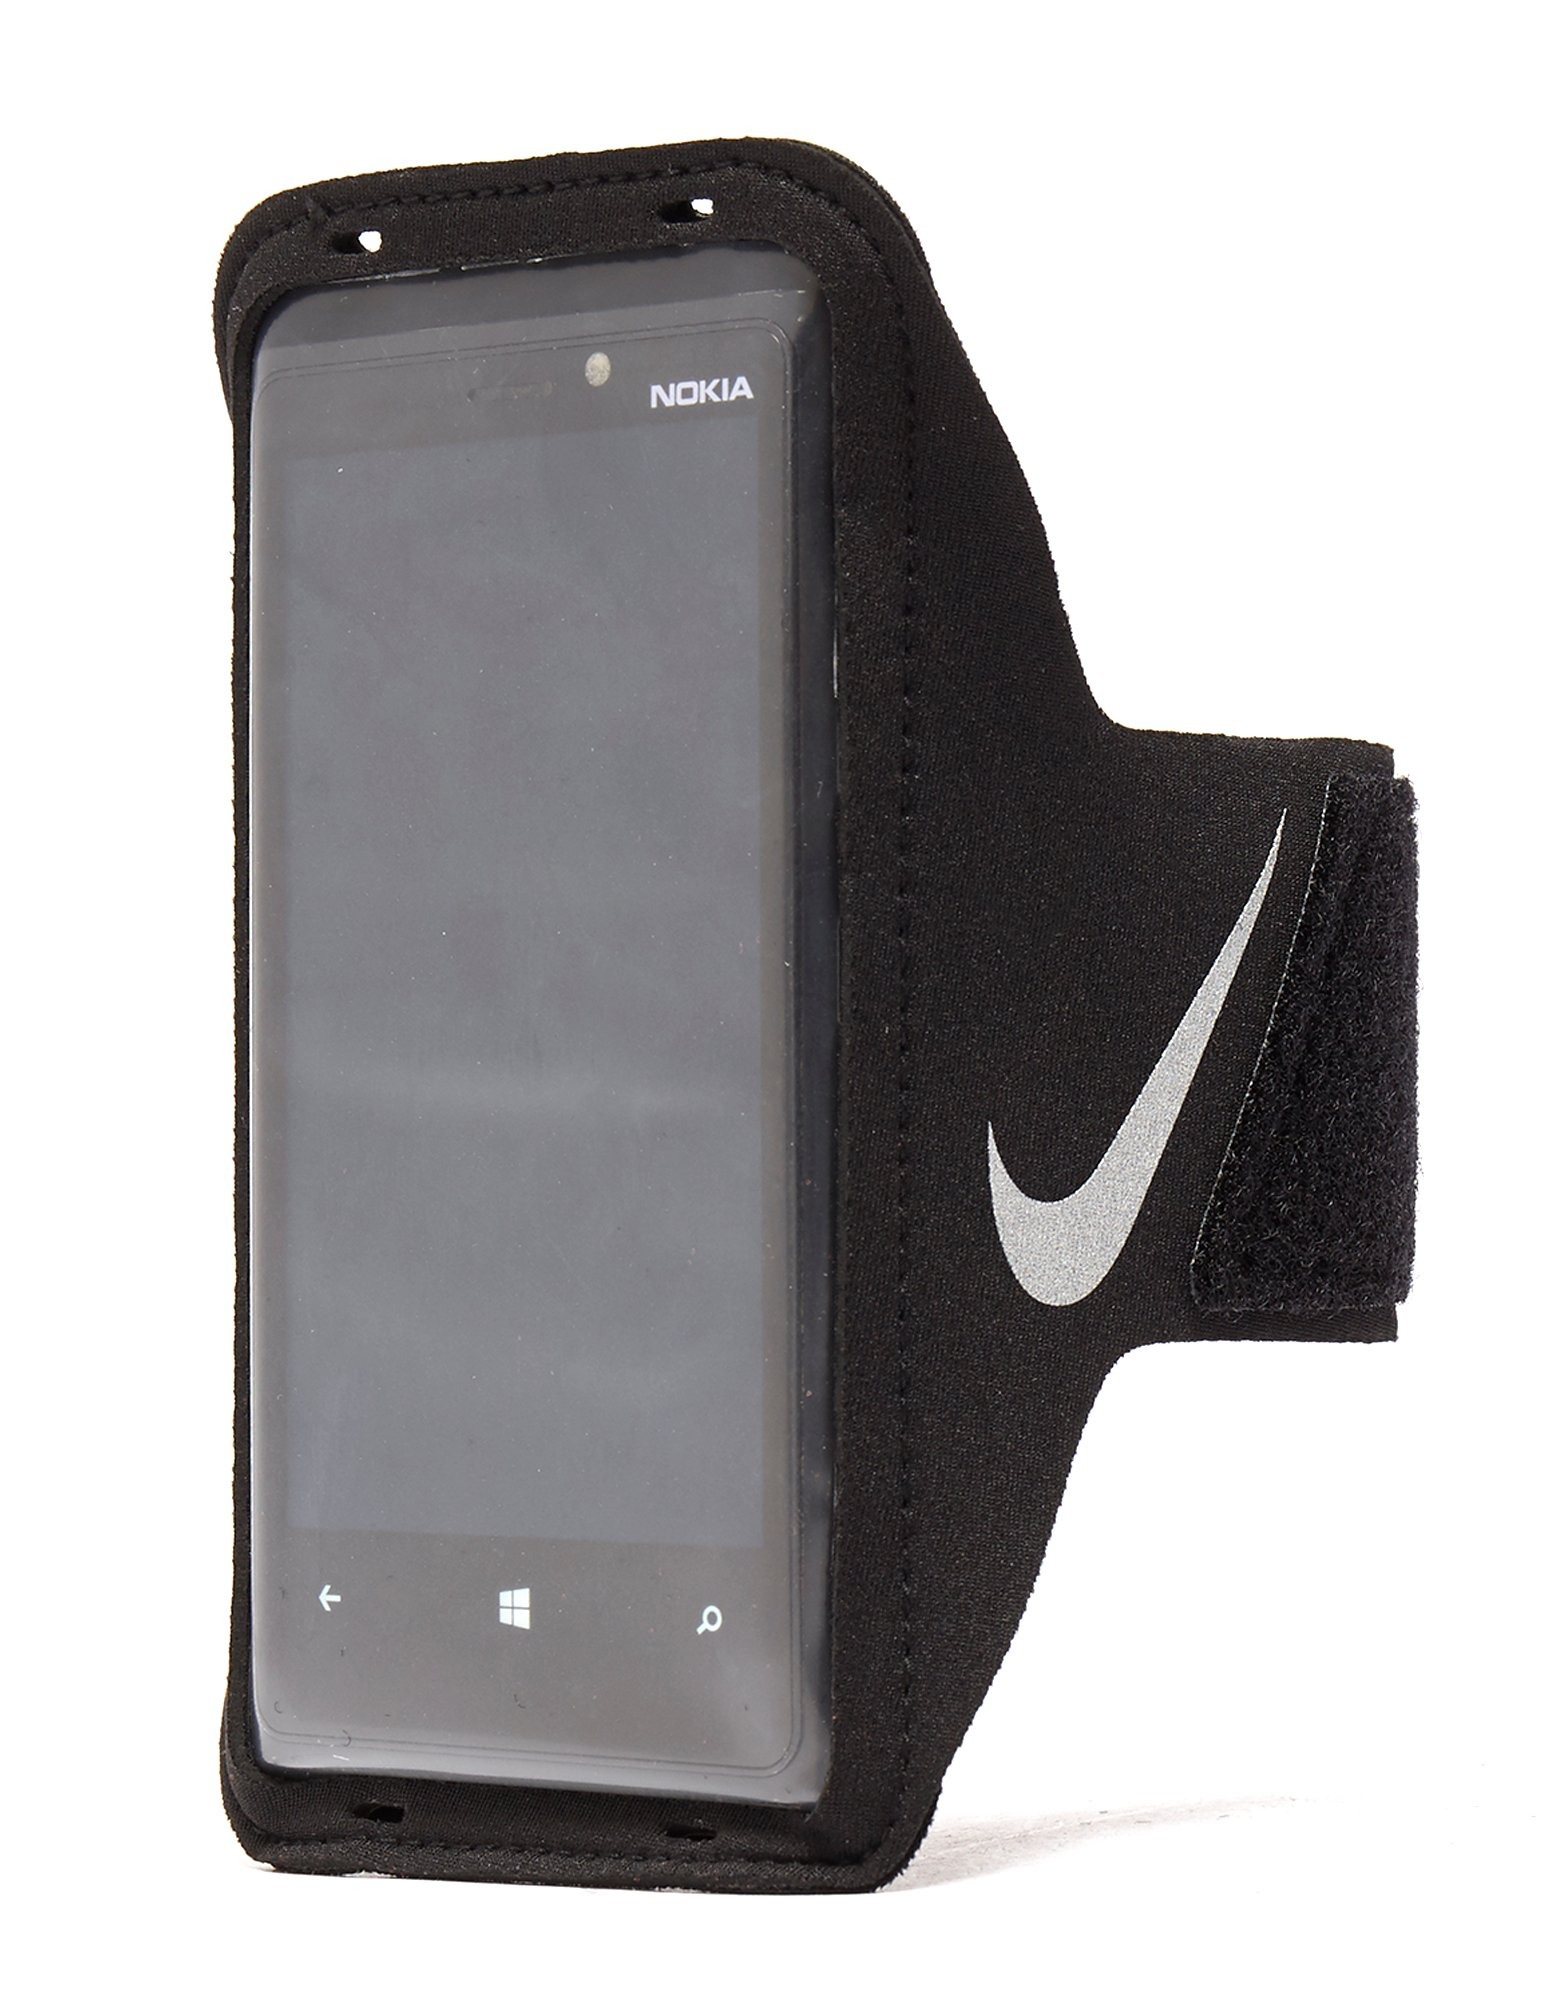 Watt Io leggo un libro Vacanza  Buy Nike Lean Arm Band | JD Sports